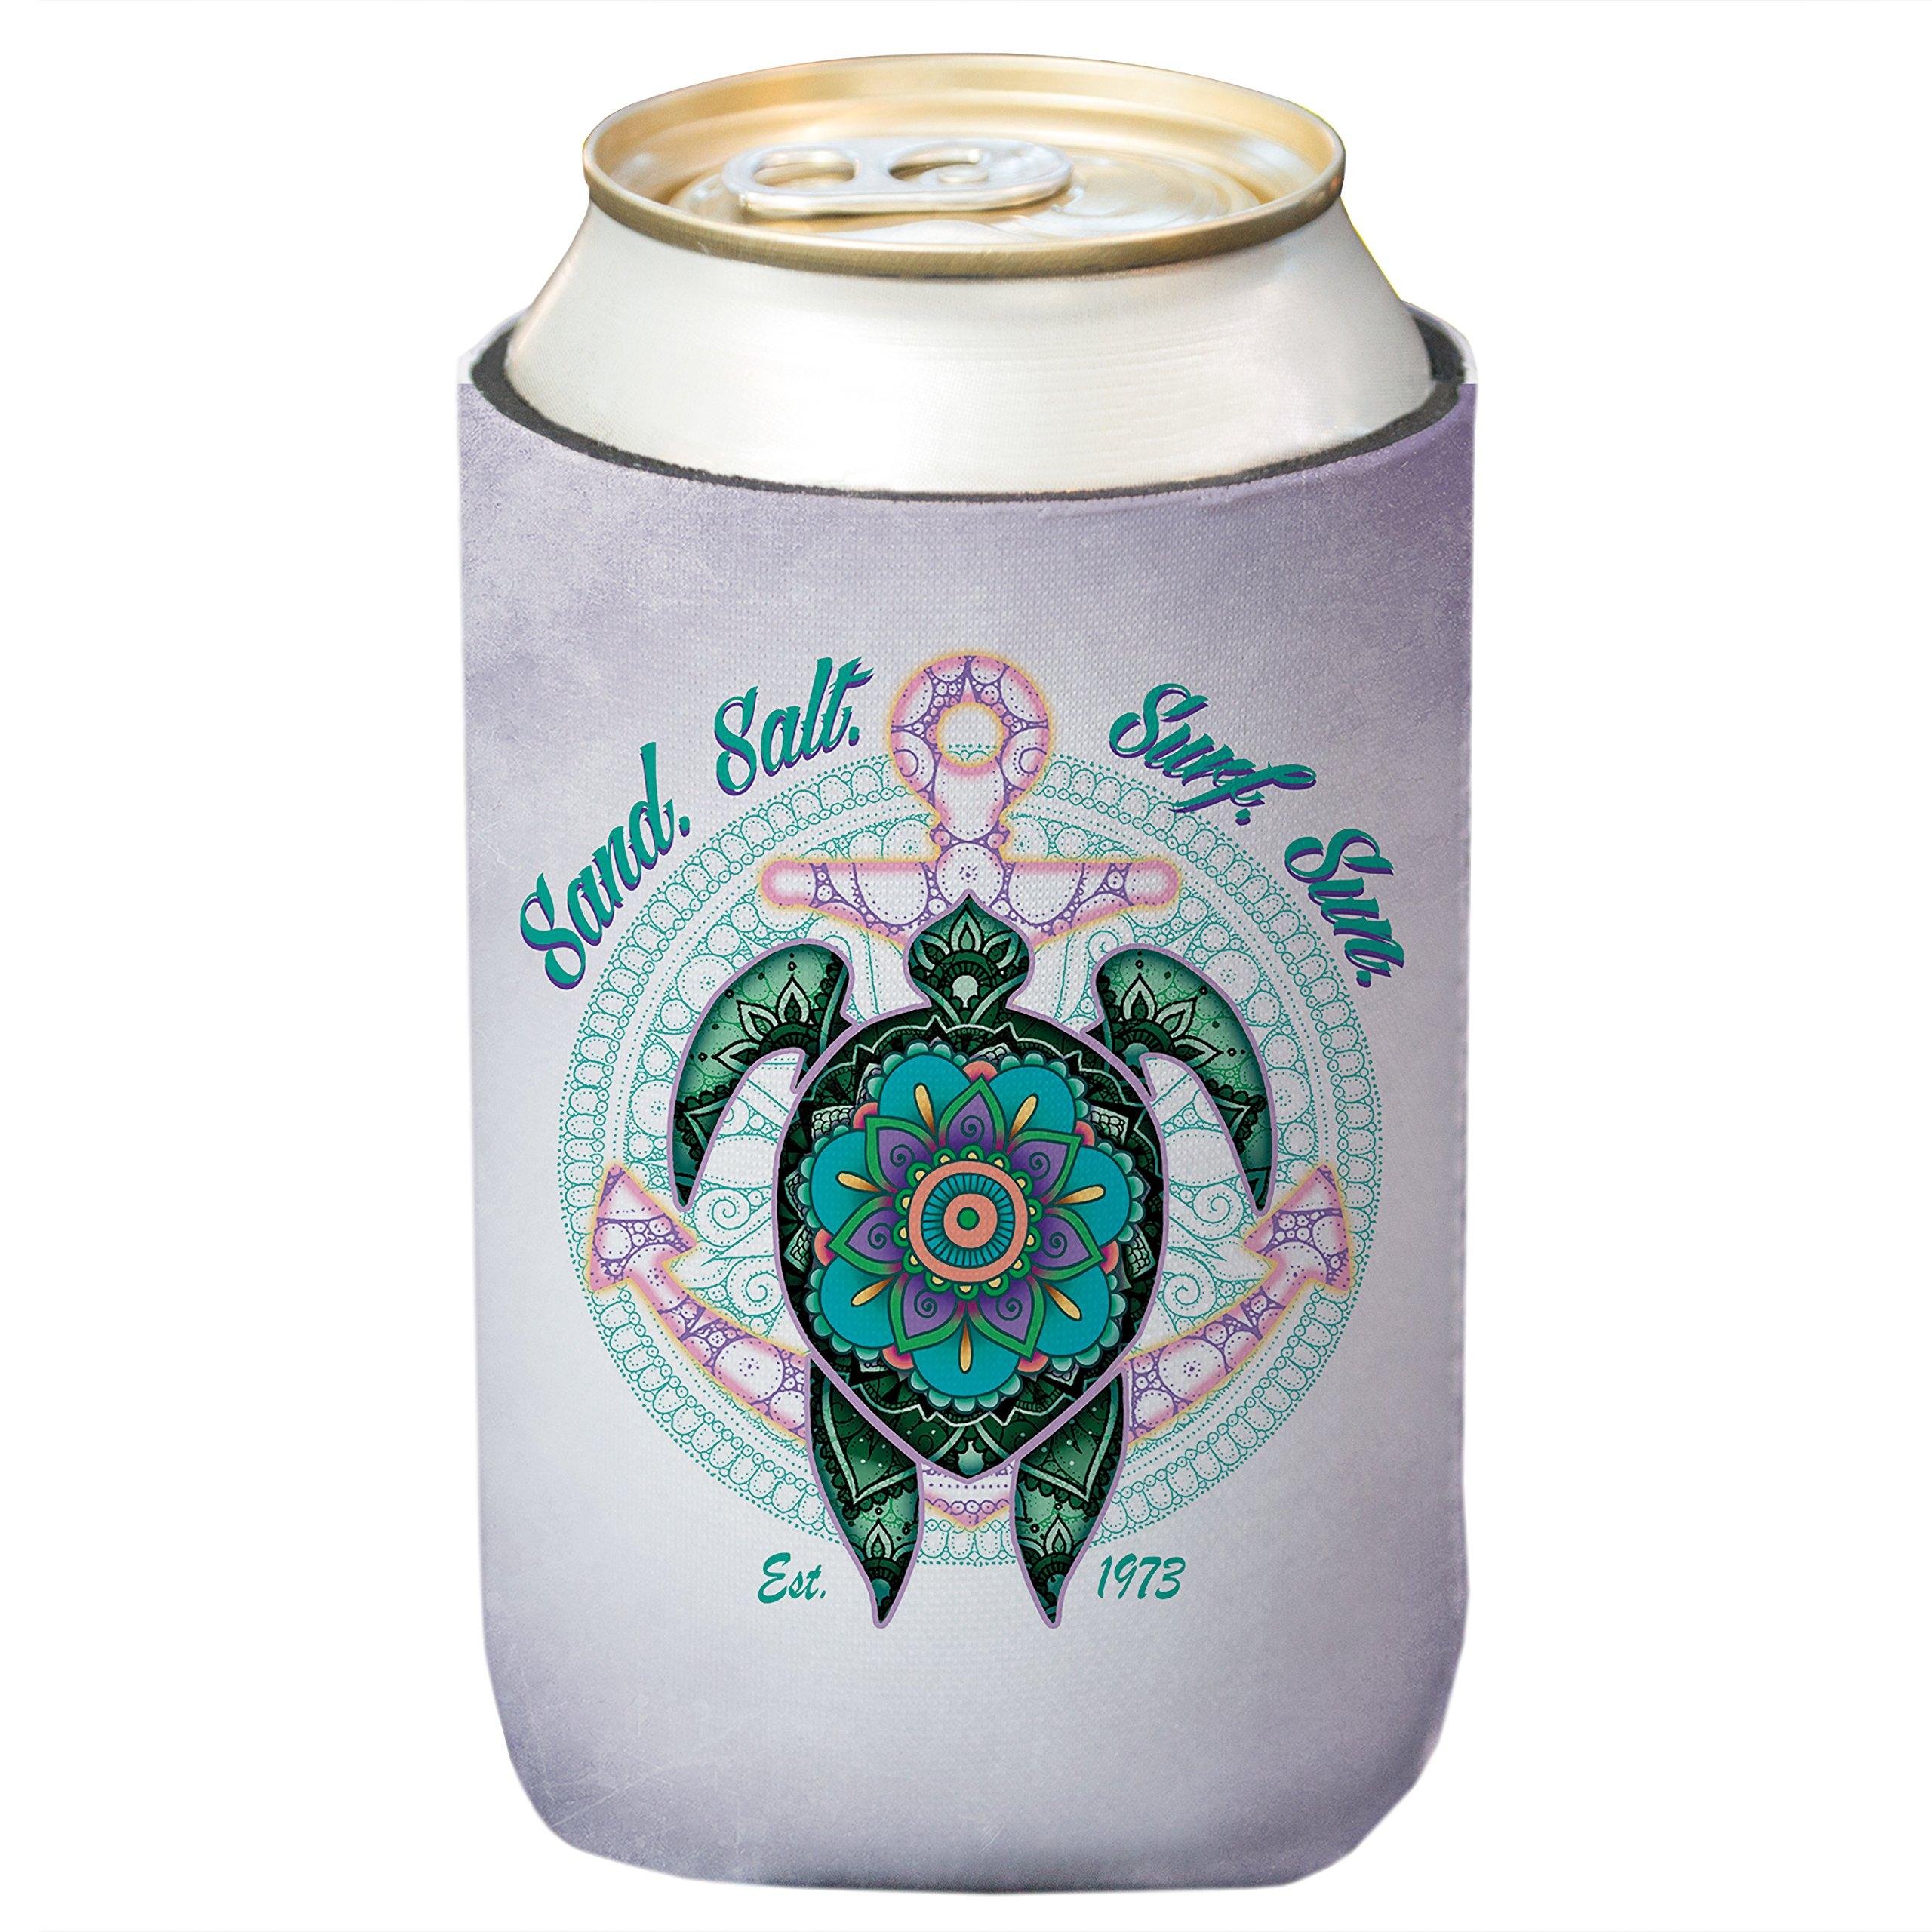 SAND.SALT.SURF.SUN Mandala Turtle Standard Can Cooler (4-Pack)